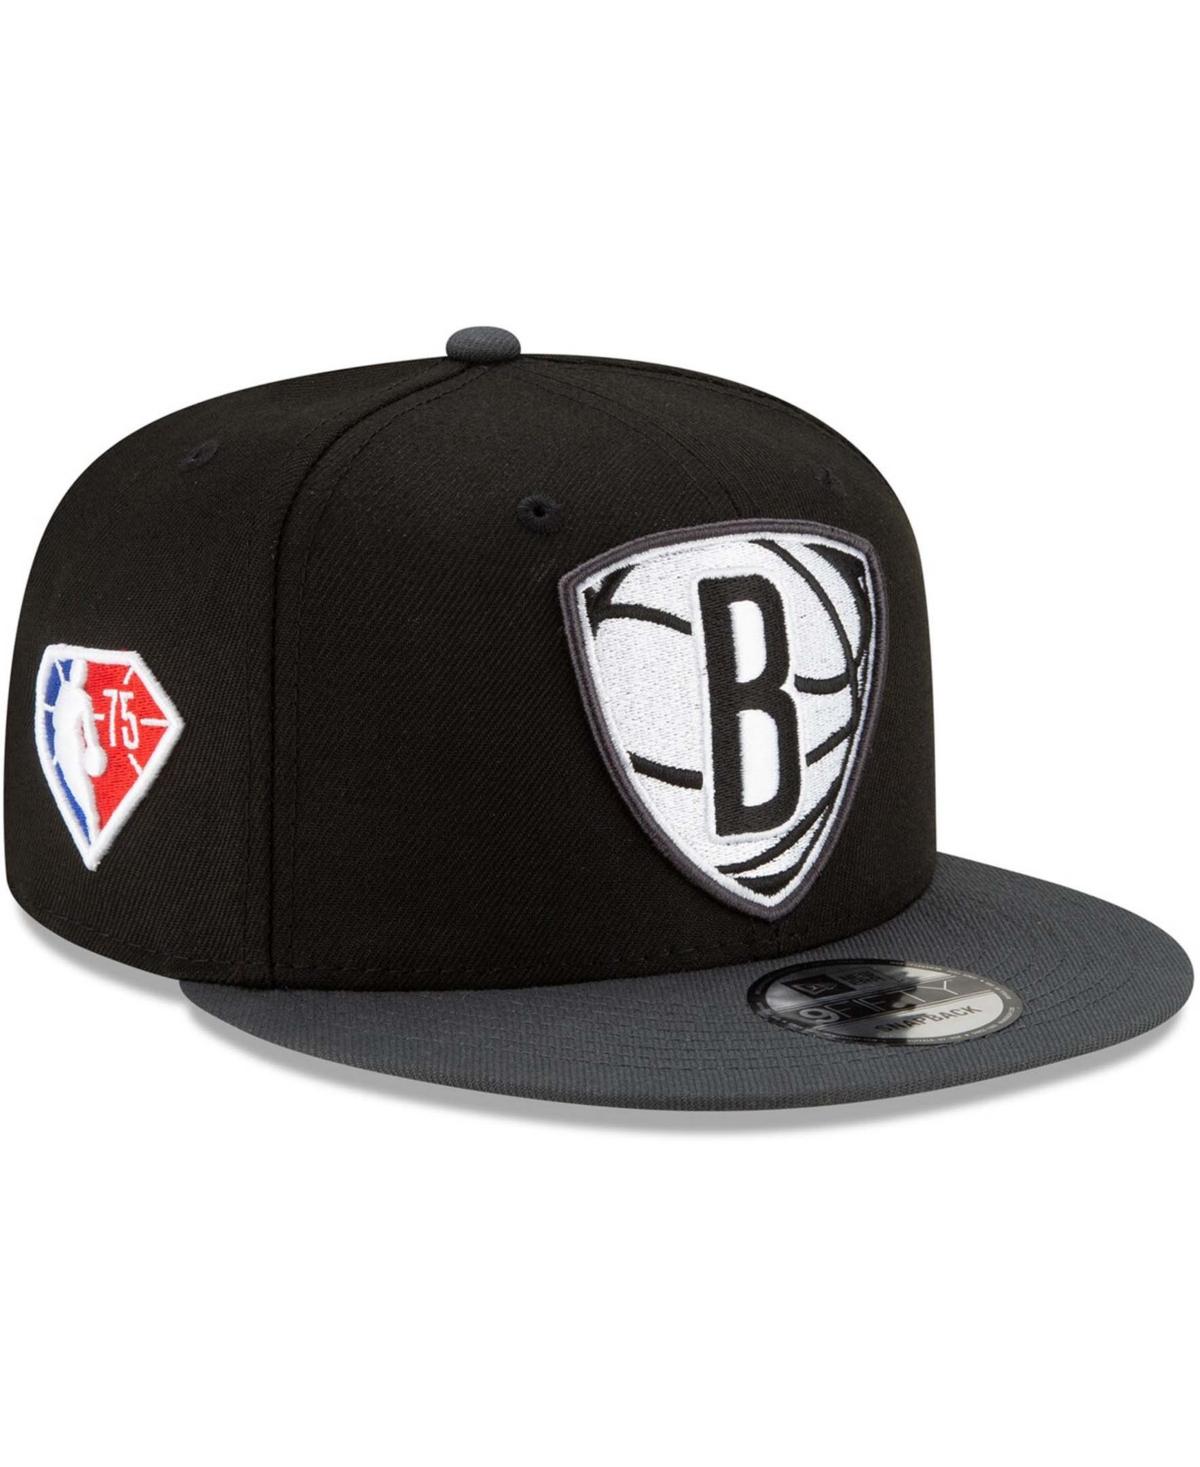 Men's Black Brooklyn Nets 2021 Nba Draft On-Stage 9Fifty Snapback Adjustable Hat